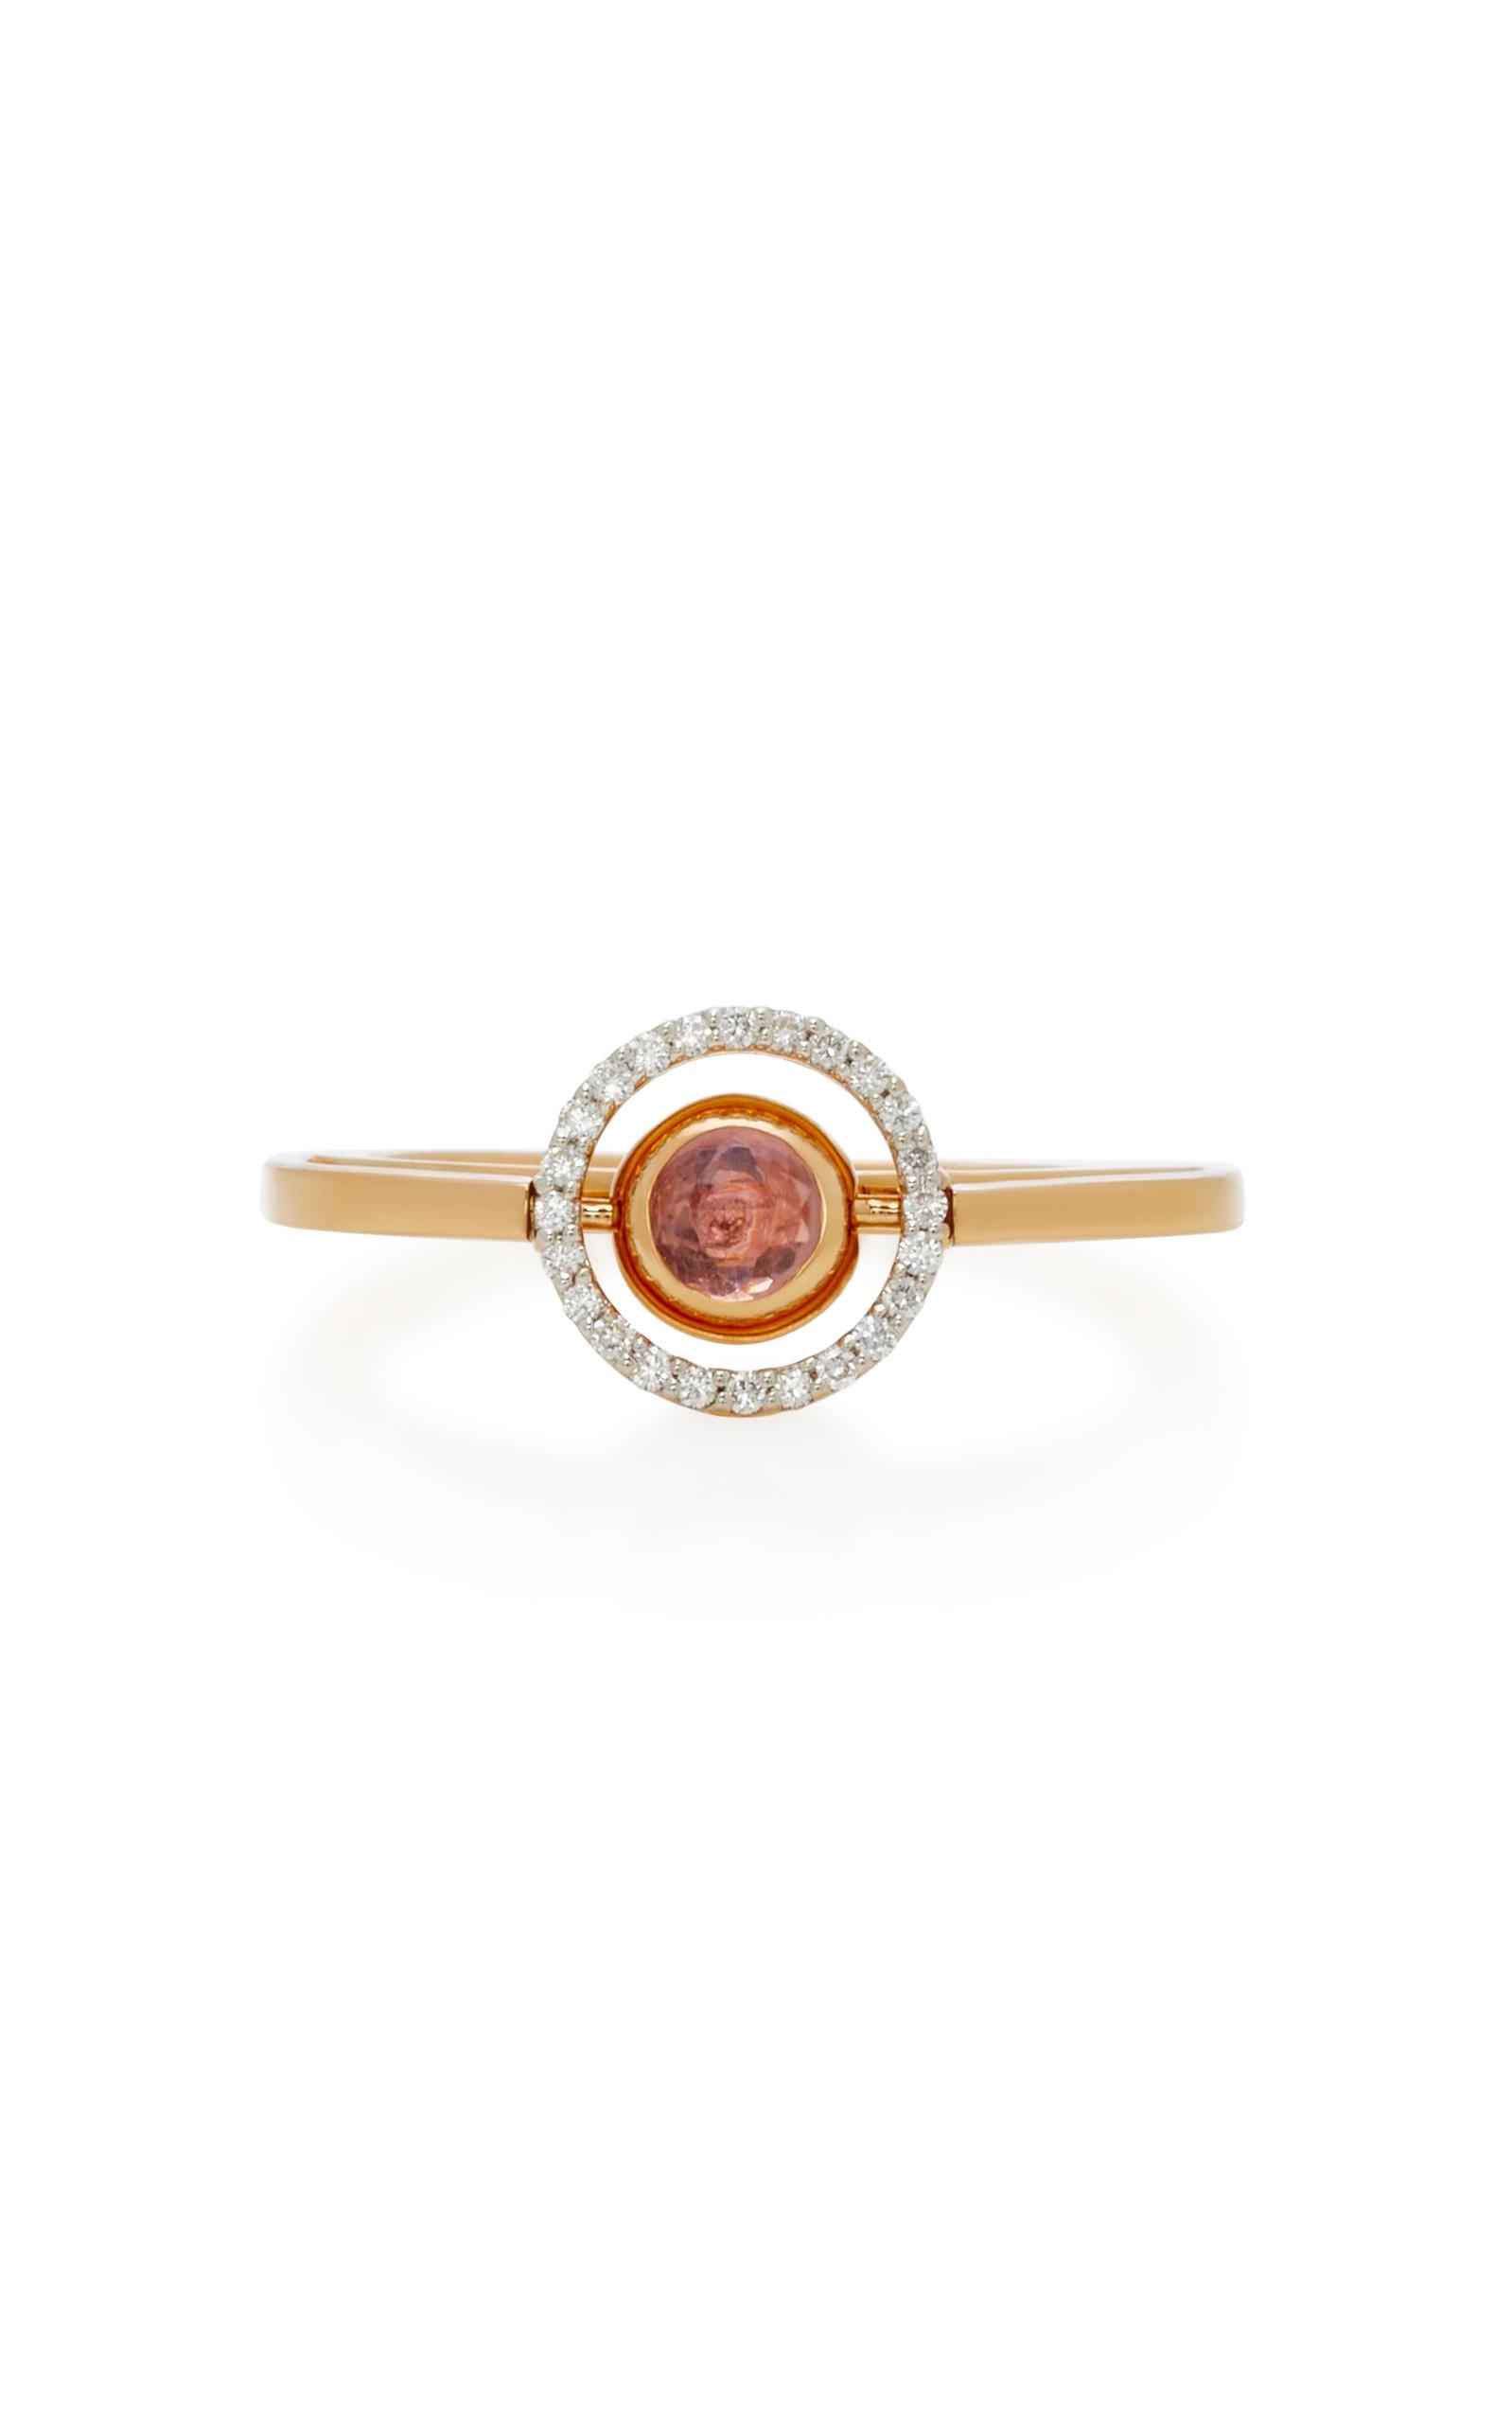 MARIE MAS SWIVELING ROSE GOLD DIAMOND AMETHYST AND TOPAZ RING